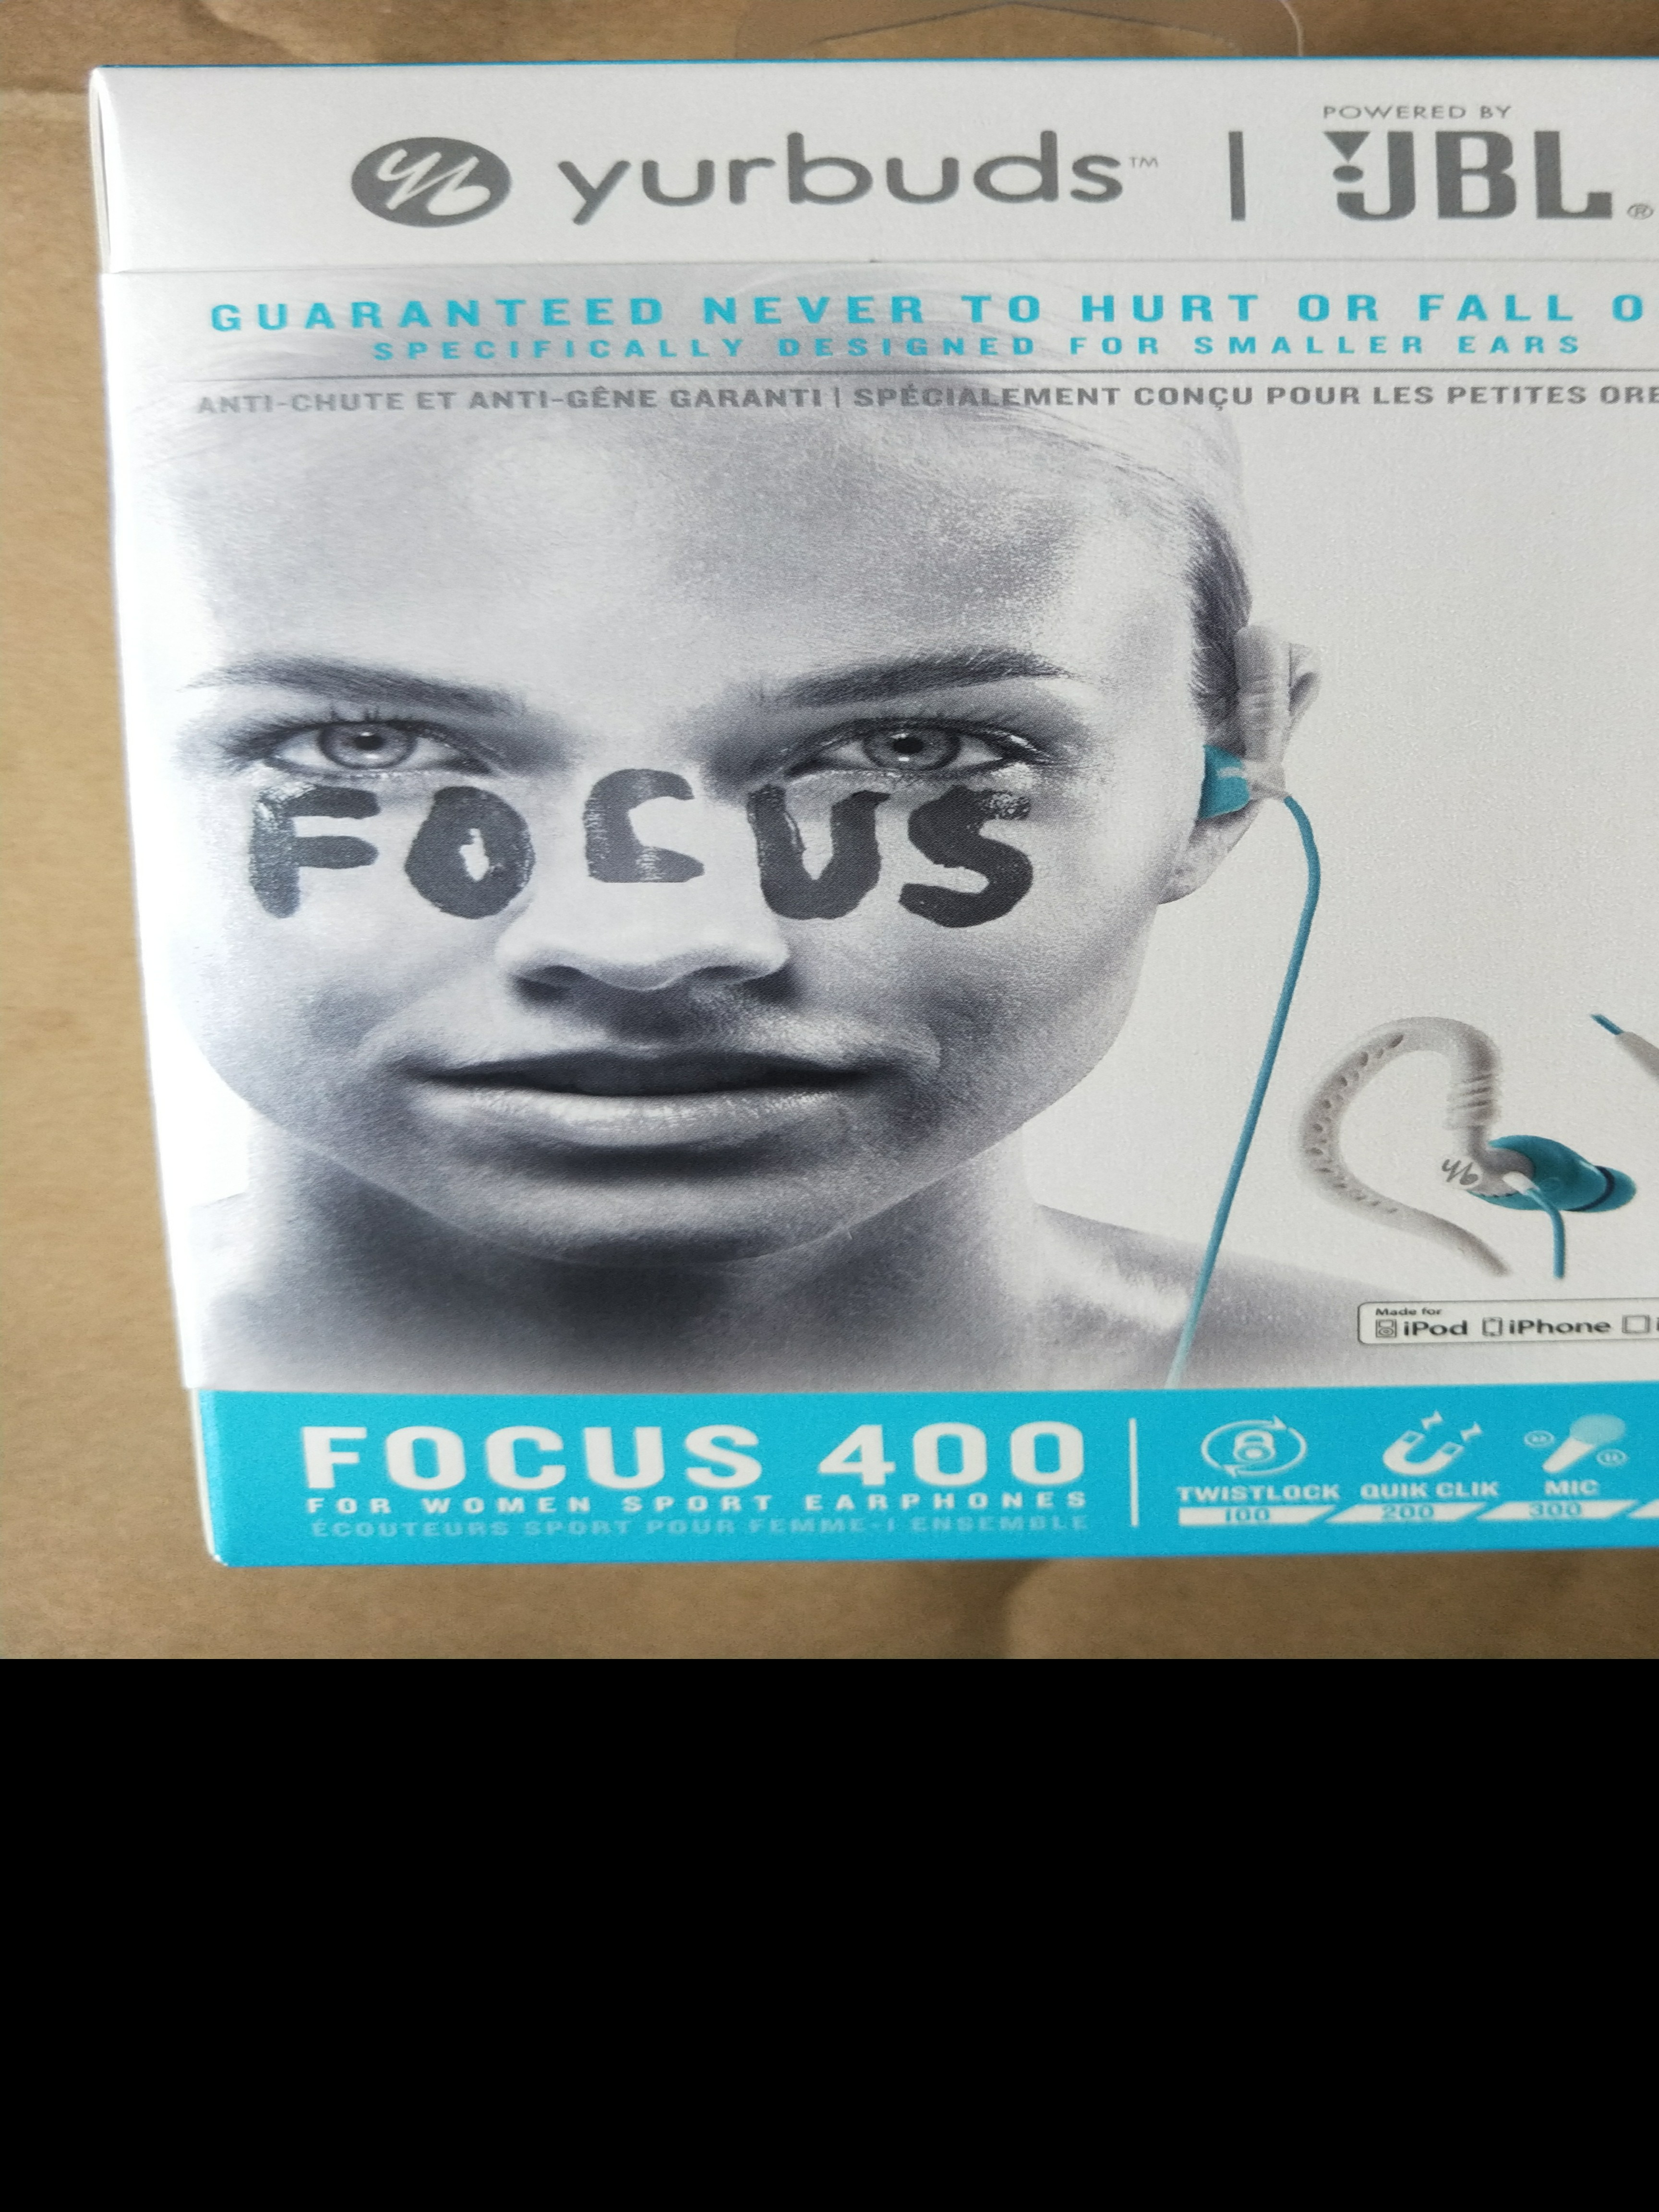 ac8fcb07f30 JBL Yurbuds Sports Earphones (for women) Yurbuds Focus 400 (Aqua ...